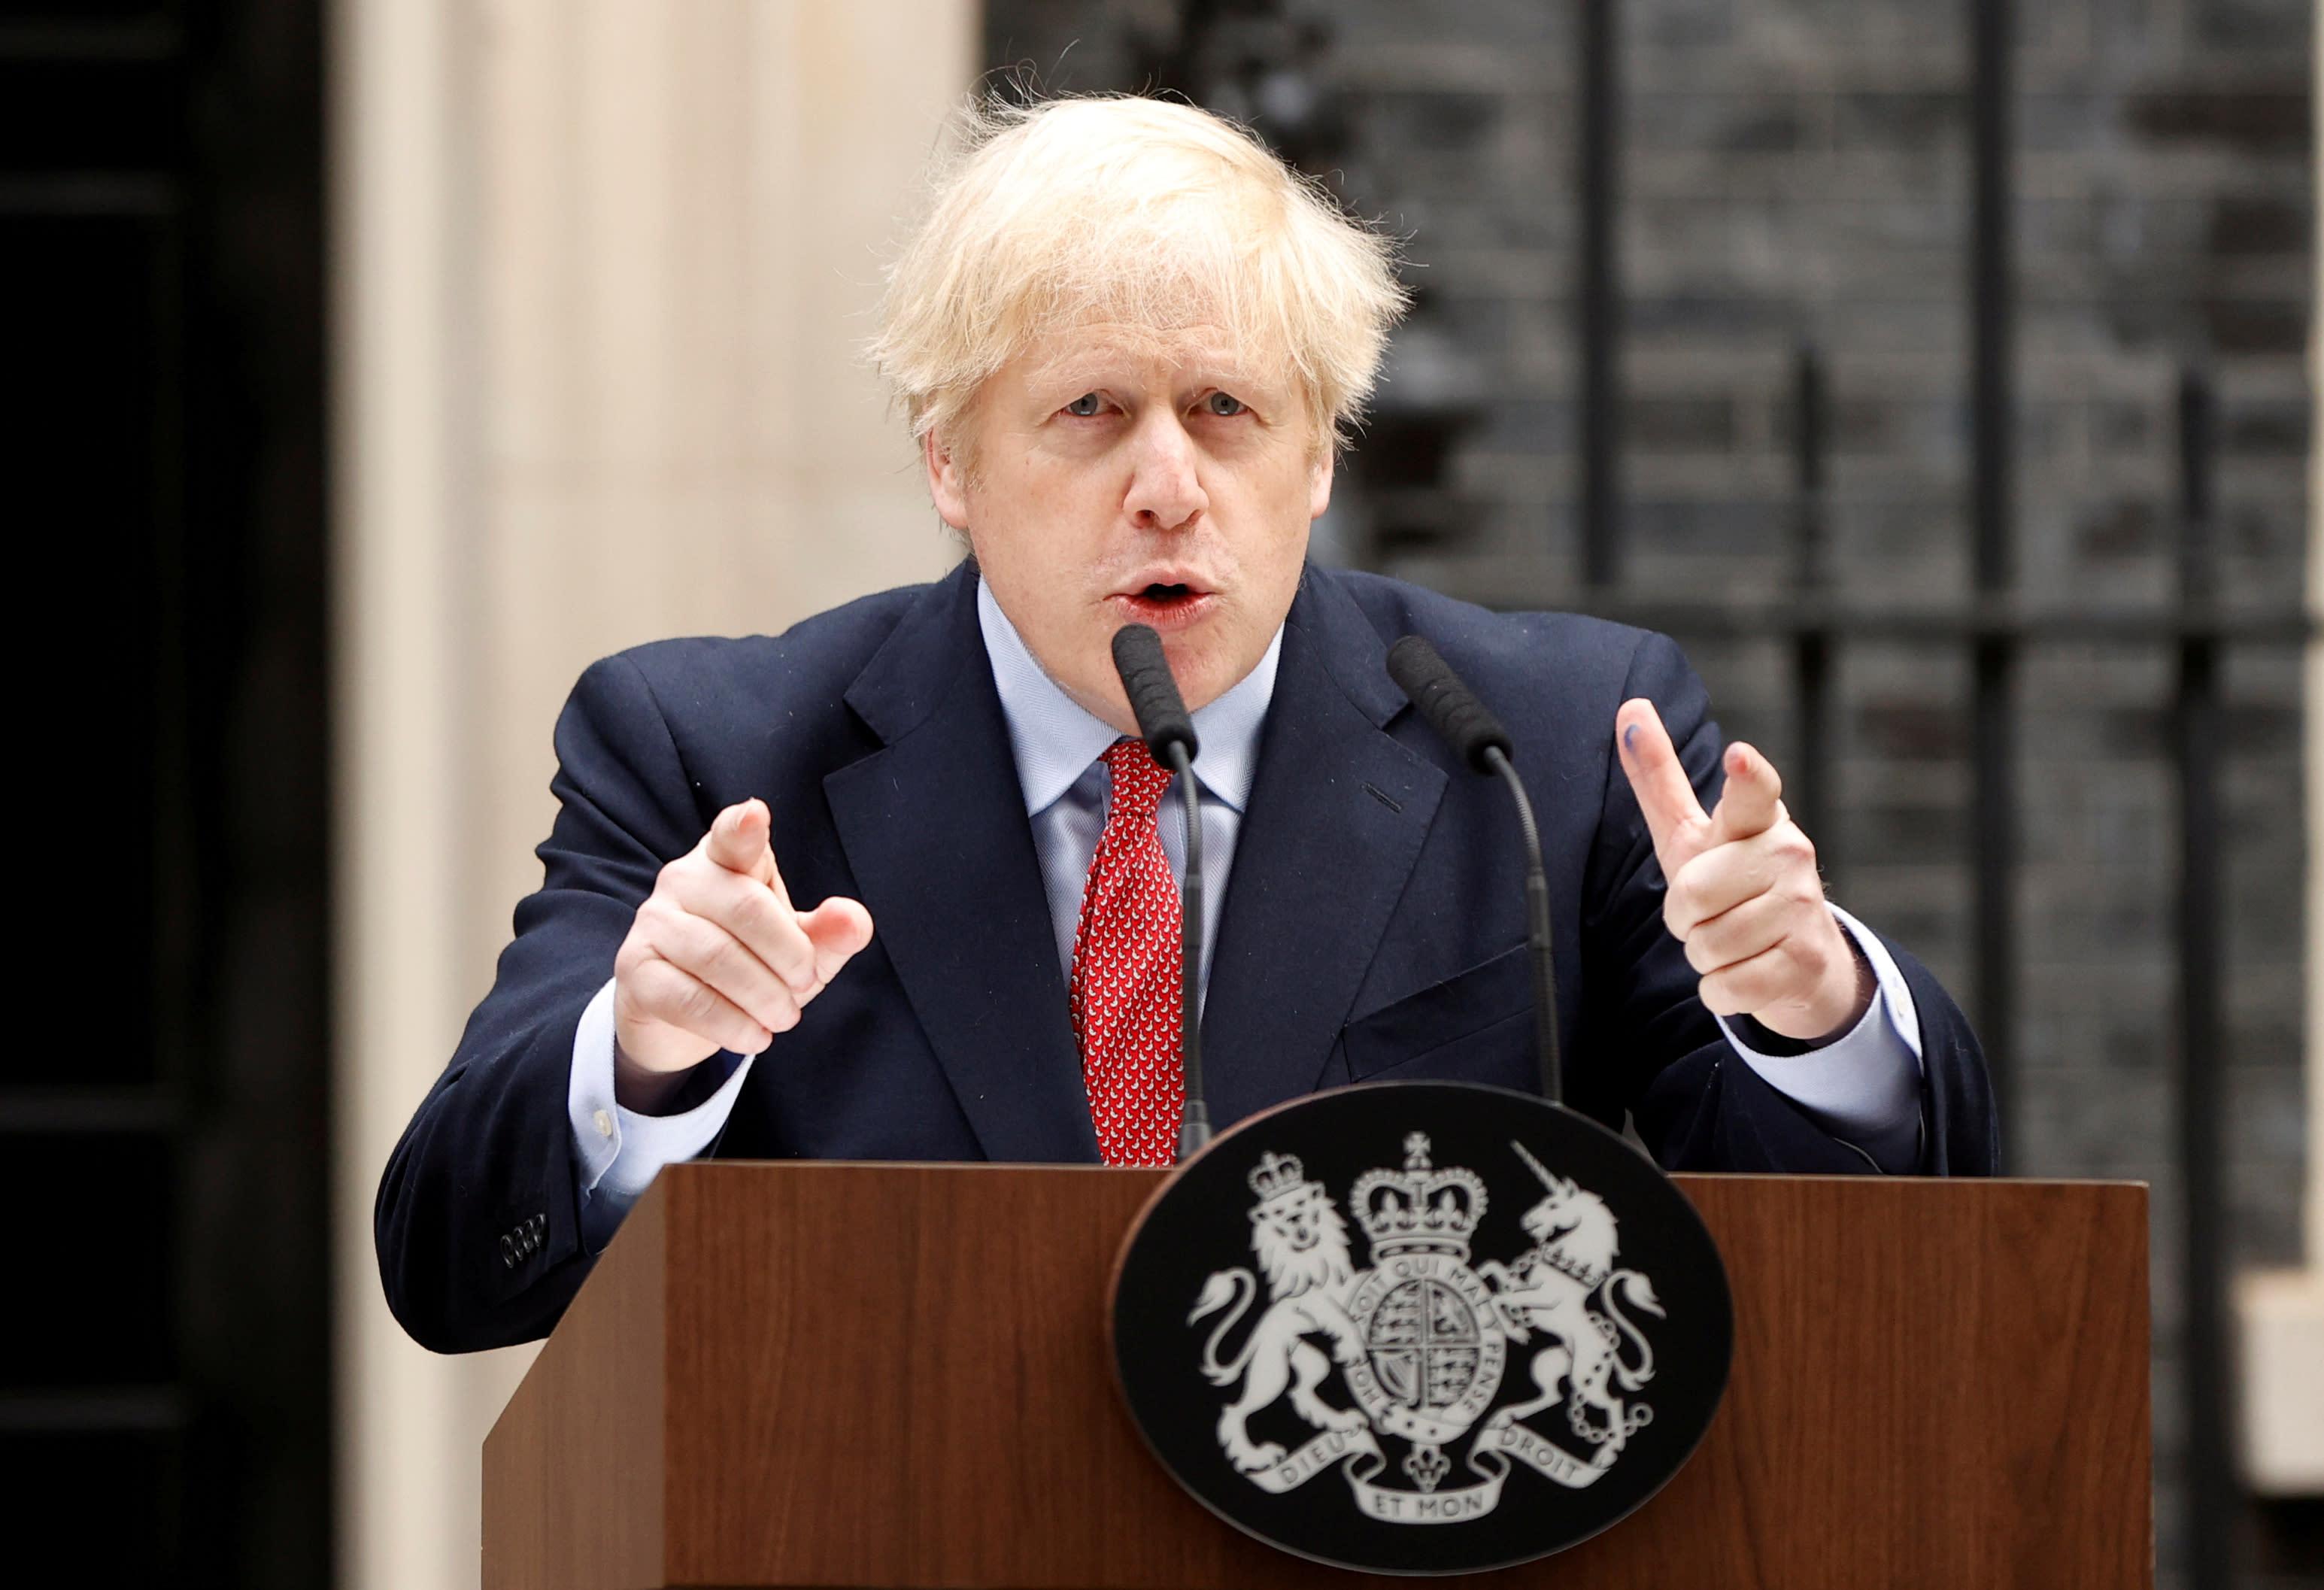 Boris poll ratings continue to fall amid COVID-19 backlash